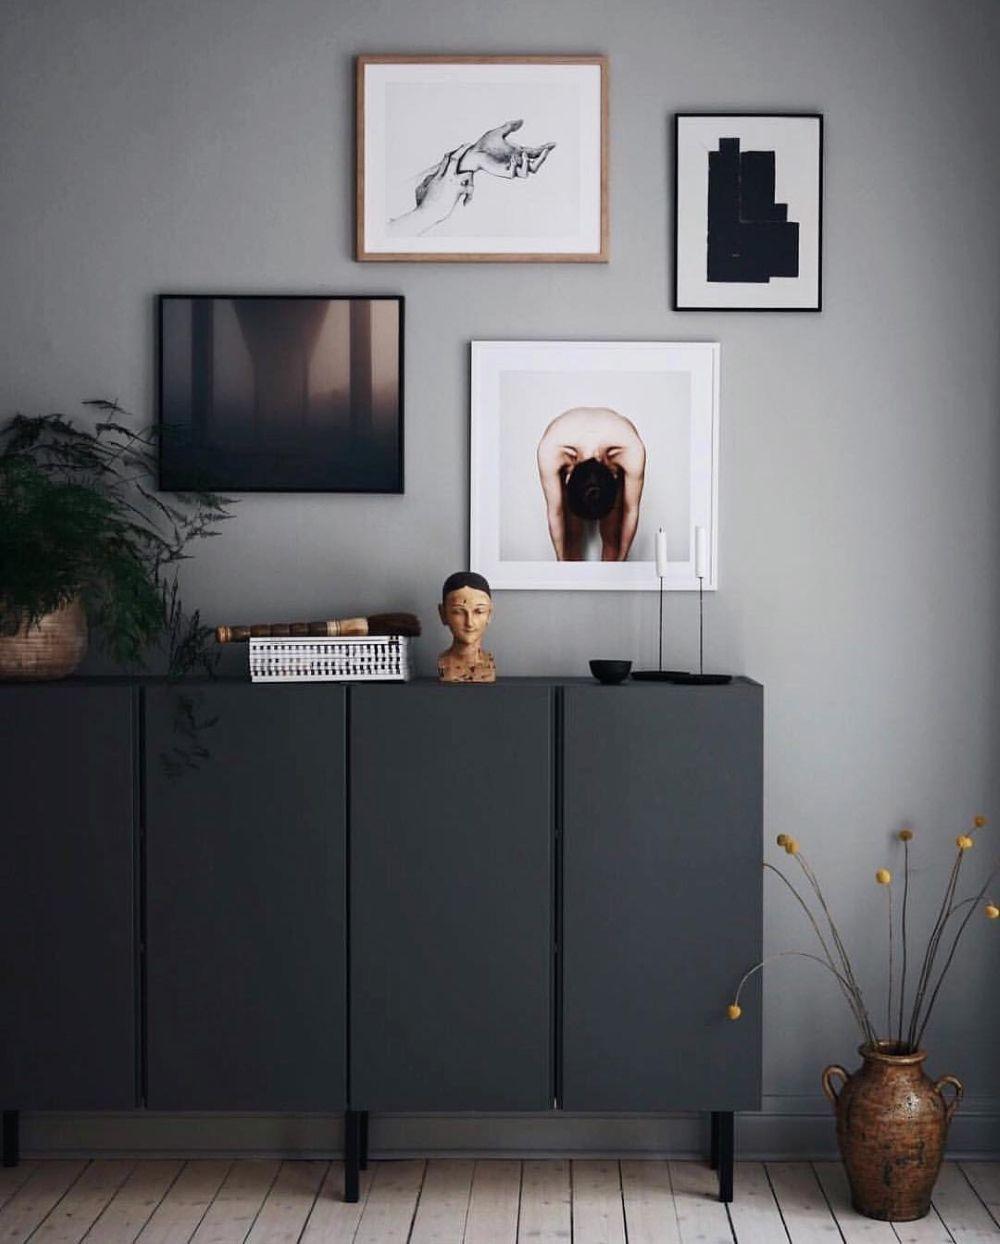 Photo of 9 Seriously Stylish IKEA IVAR Cabinet Hacks, That Won't break the Bank! • Grillo Designs